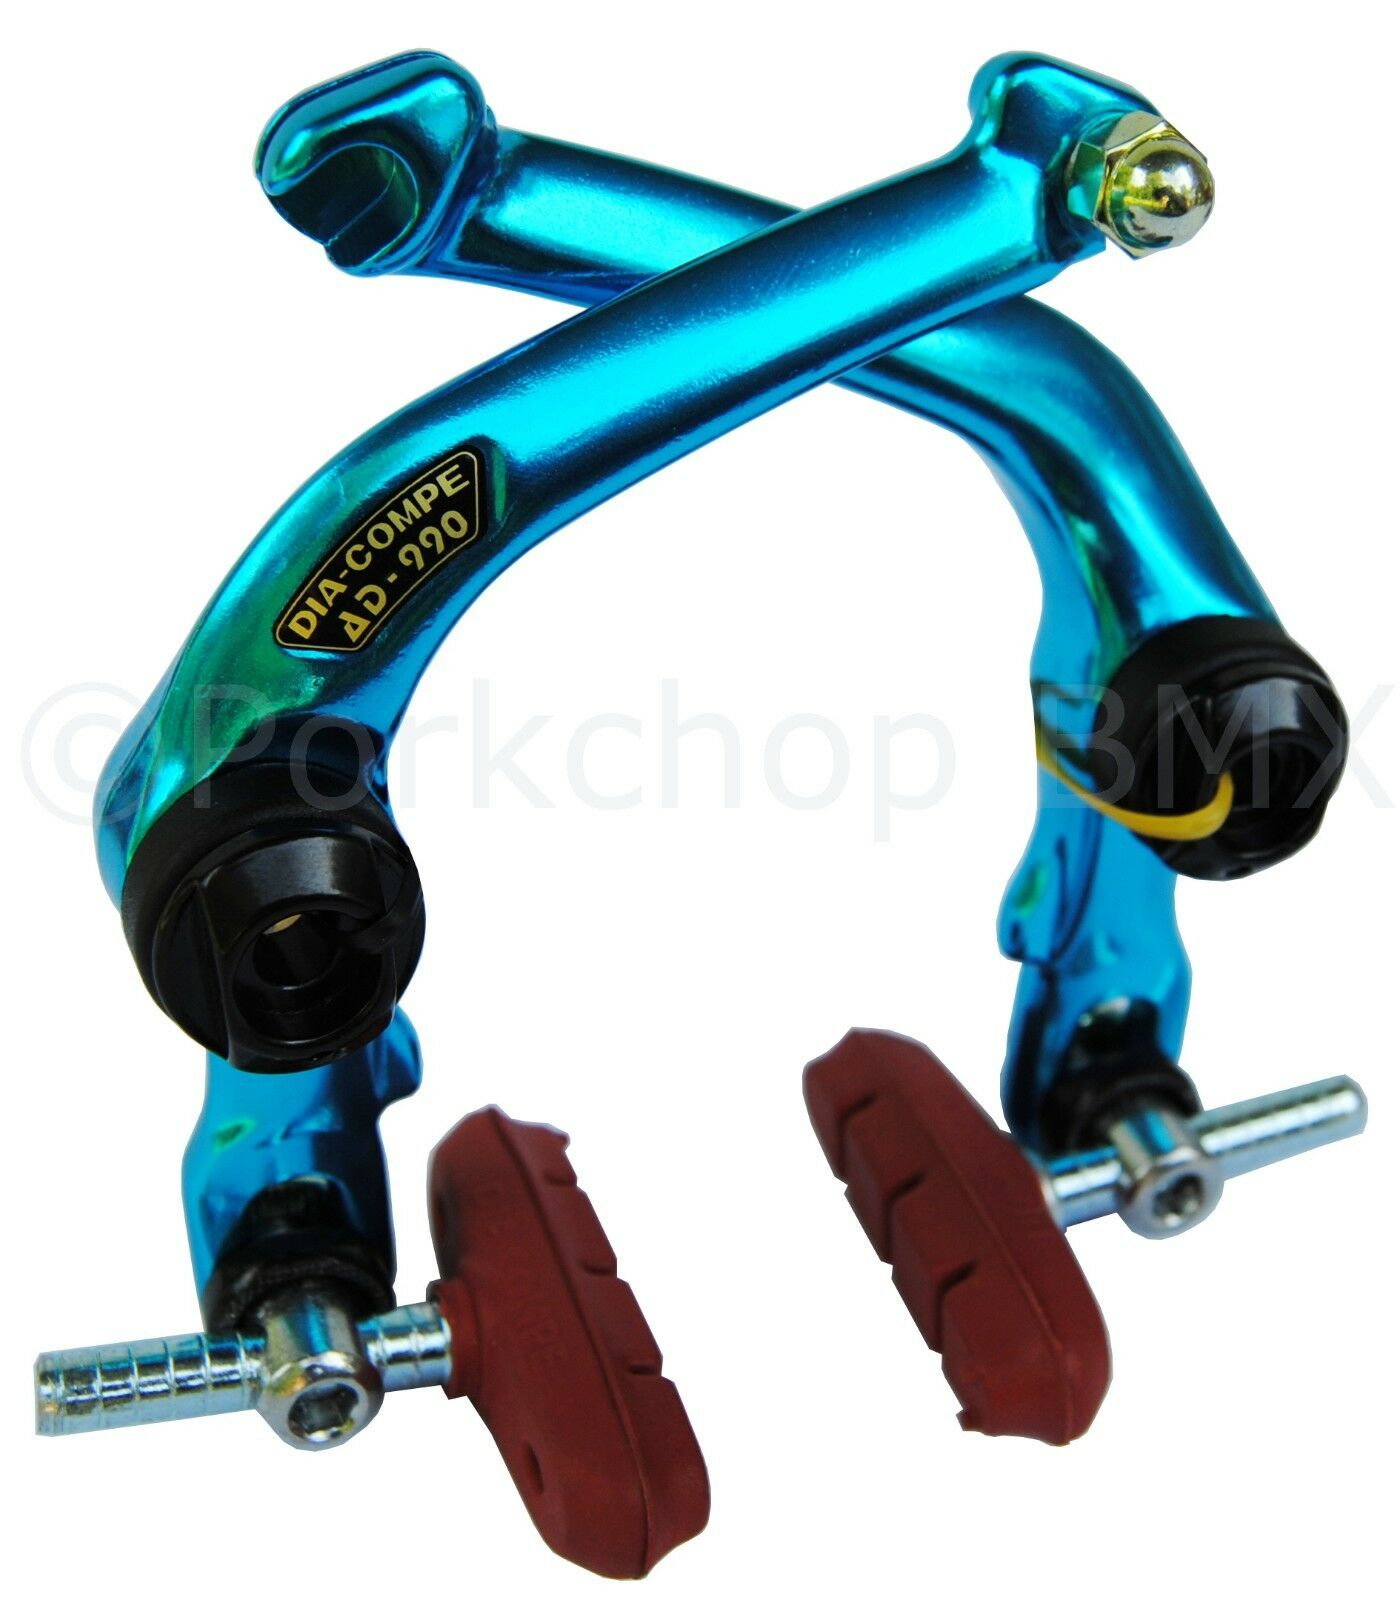 Dia-Compe AD-990 FS-990 front or rear BMX U-brake bicycle brake caliper - blueeE